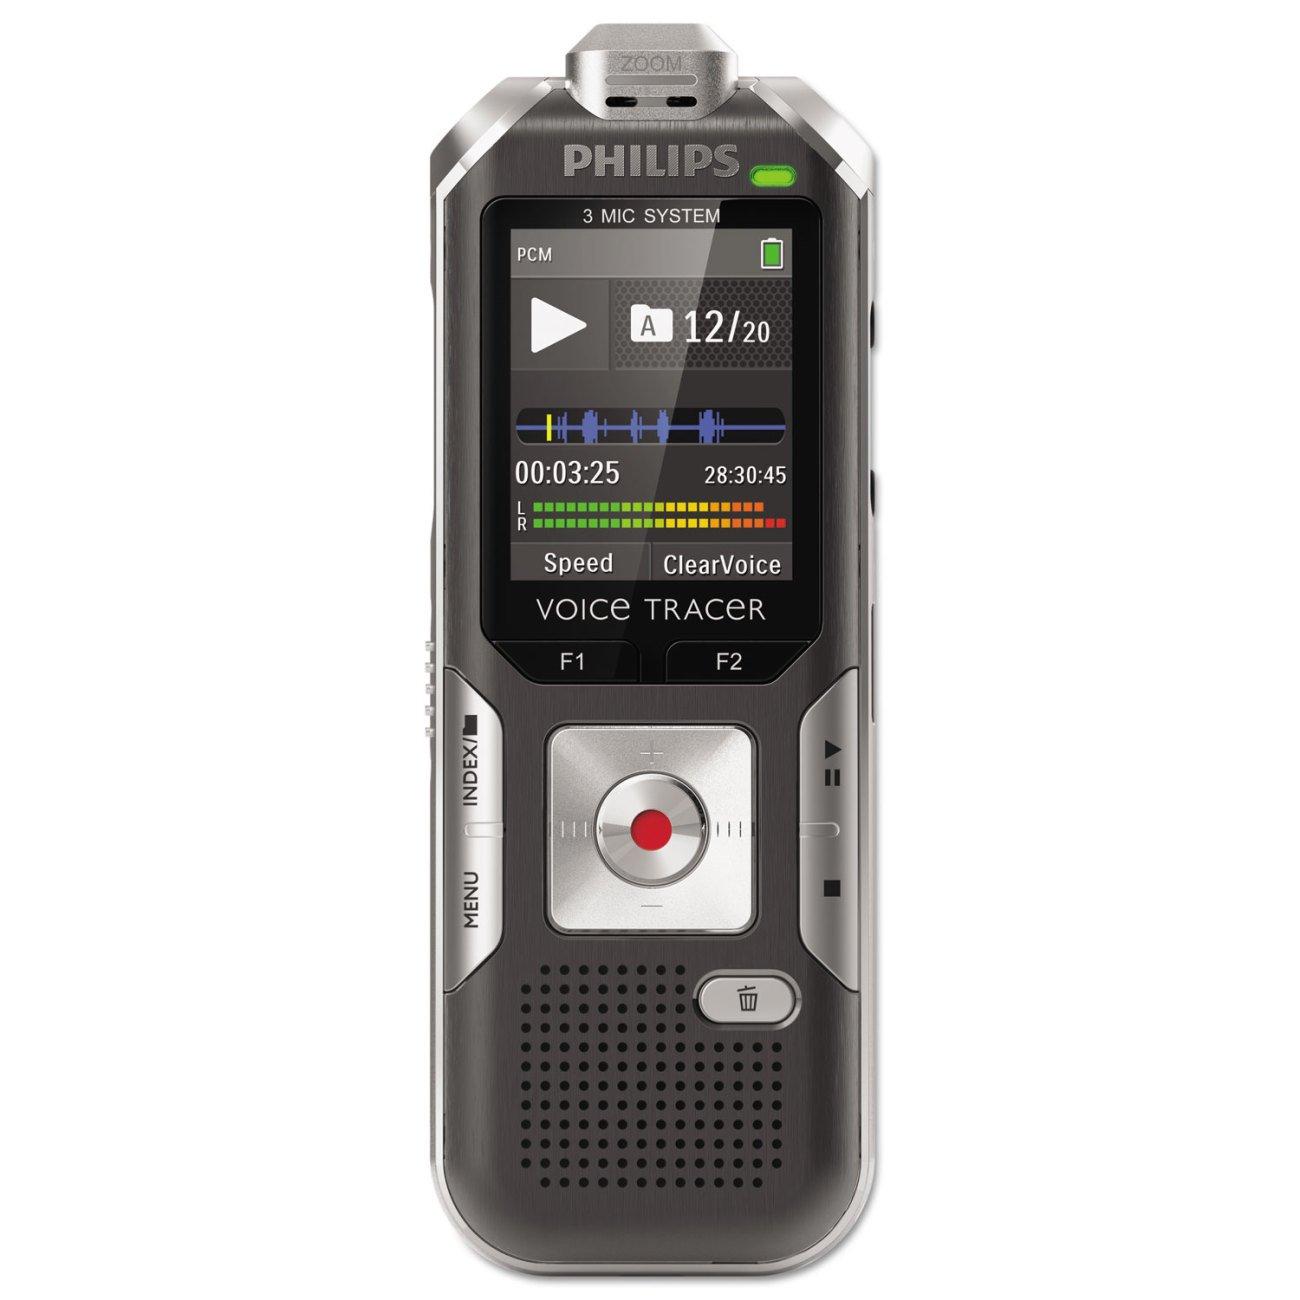 PHILIPS DVT6000 RECORDER 3MIC AUTOZM 4GB Philips Electronics DVT6000/00